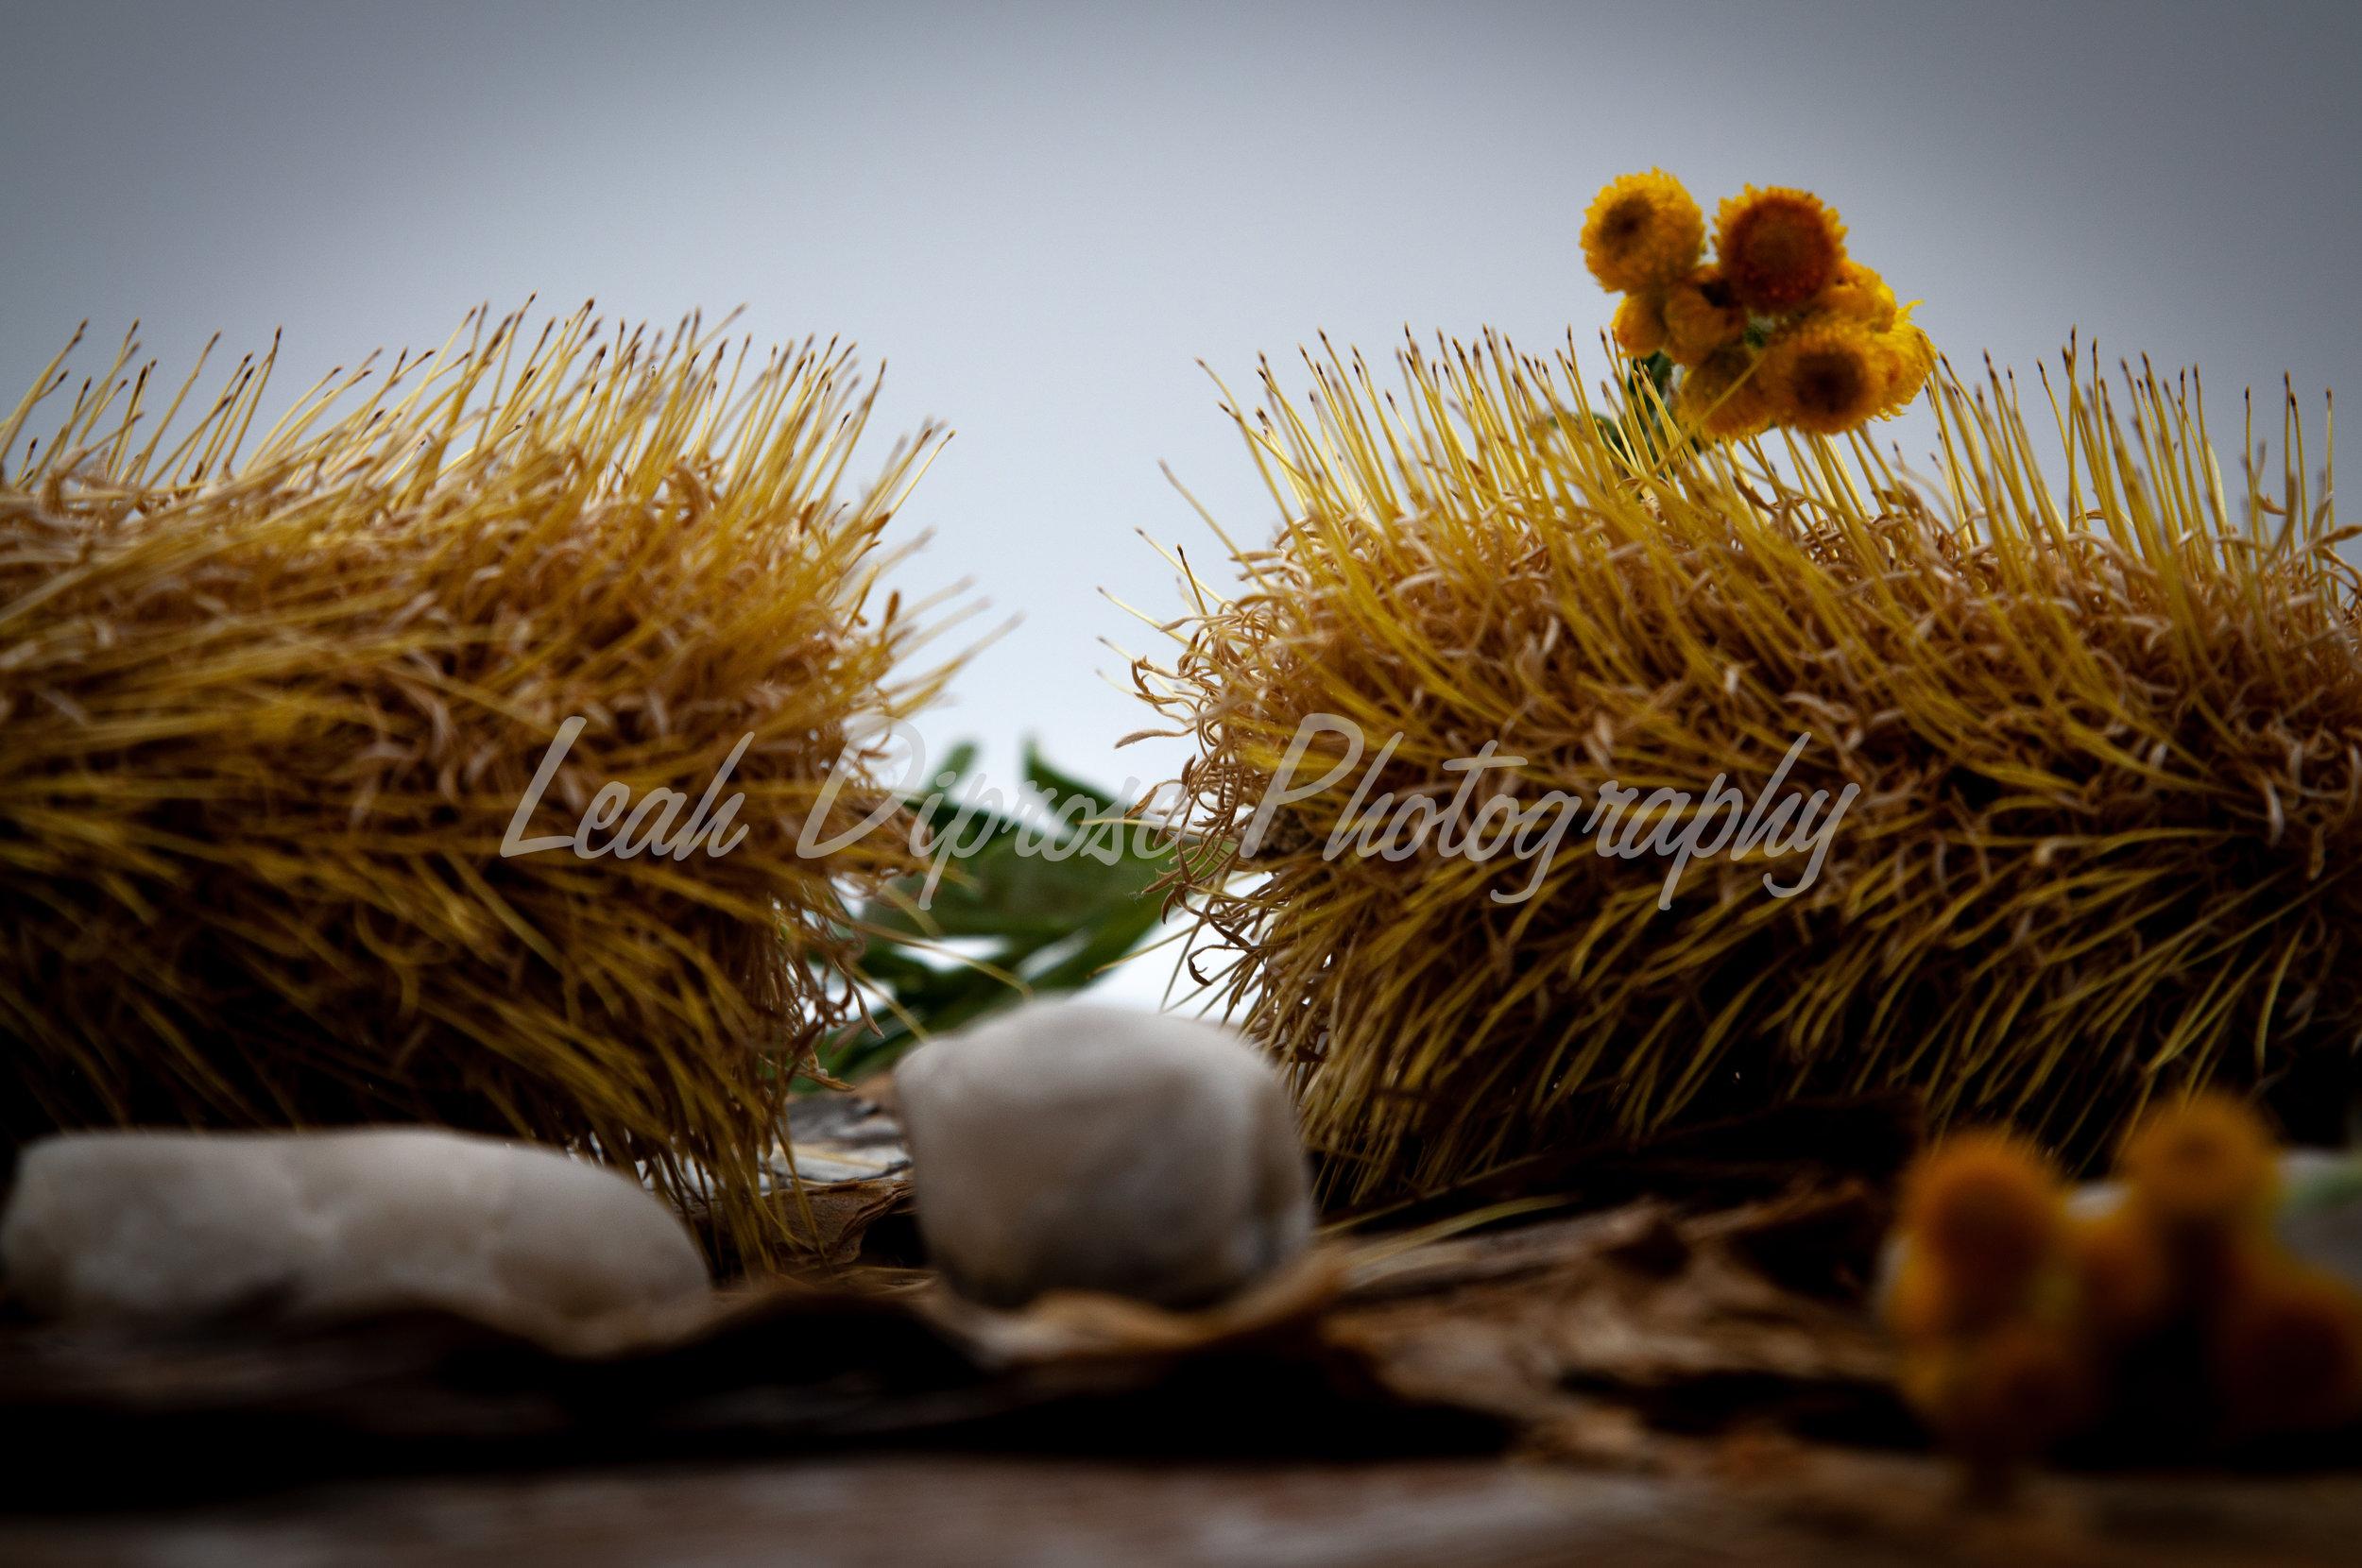 Leah Diprose Photography image-1582.jpg